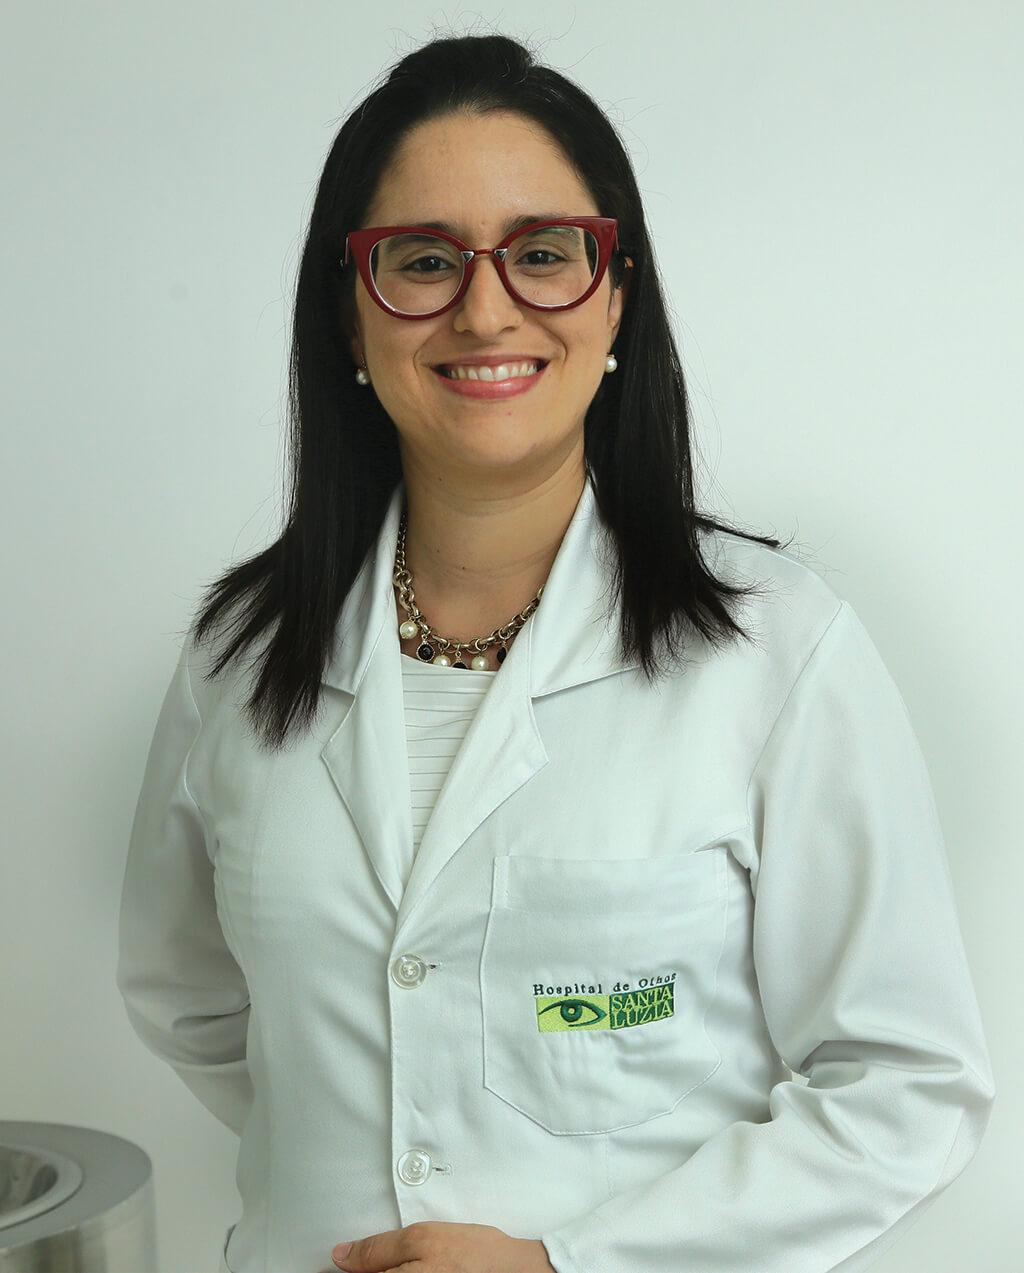 Hayana Rangel (CRM 17492)